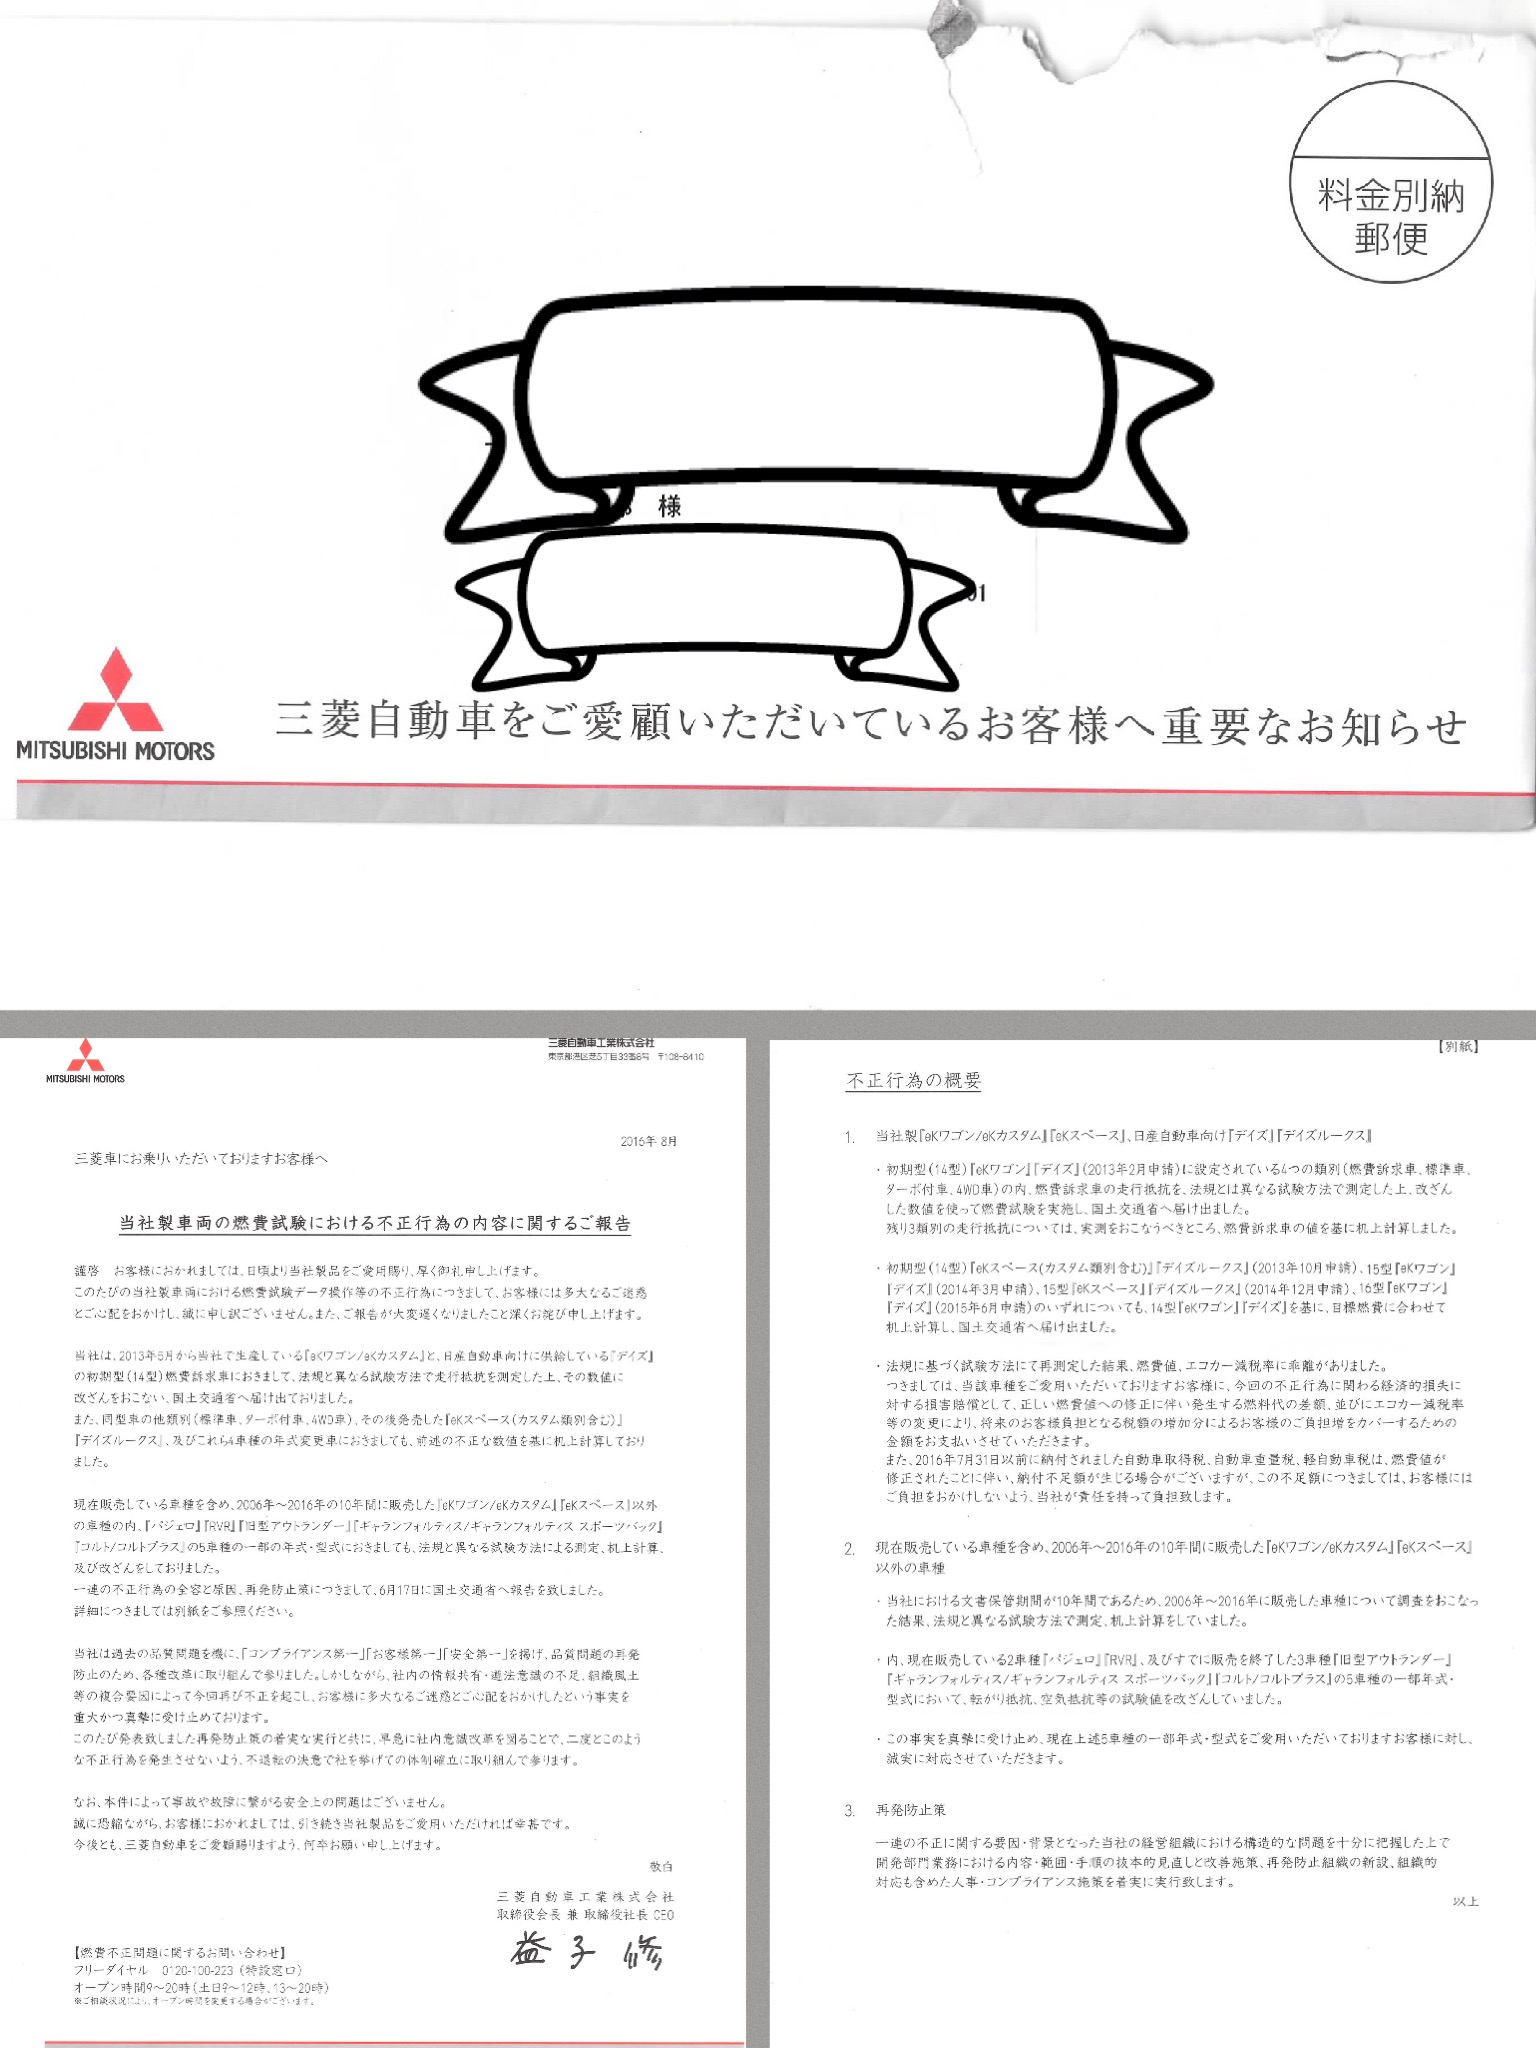 三菱自動車 燃費不正お詫び状